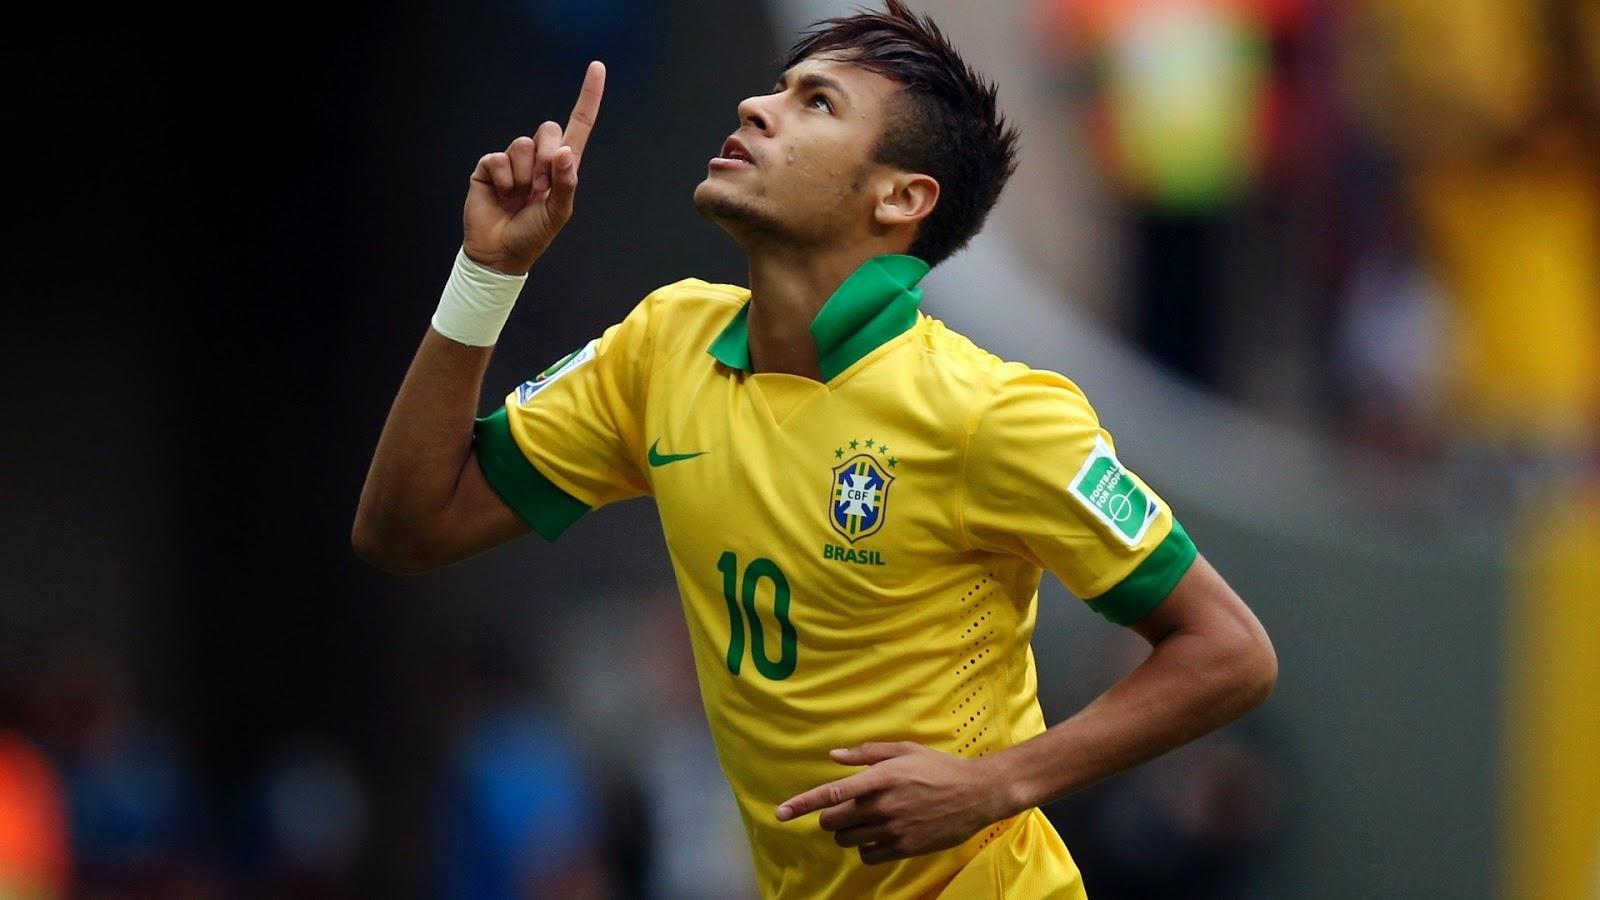 Neymar trascina il Brasile: Croazia a testa alta